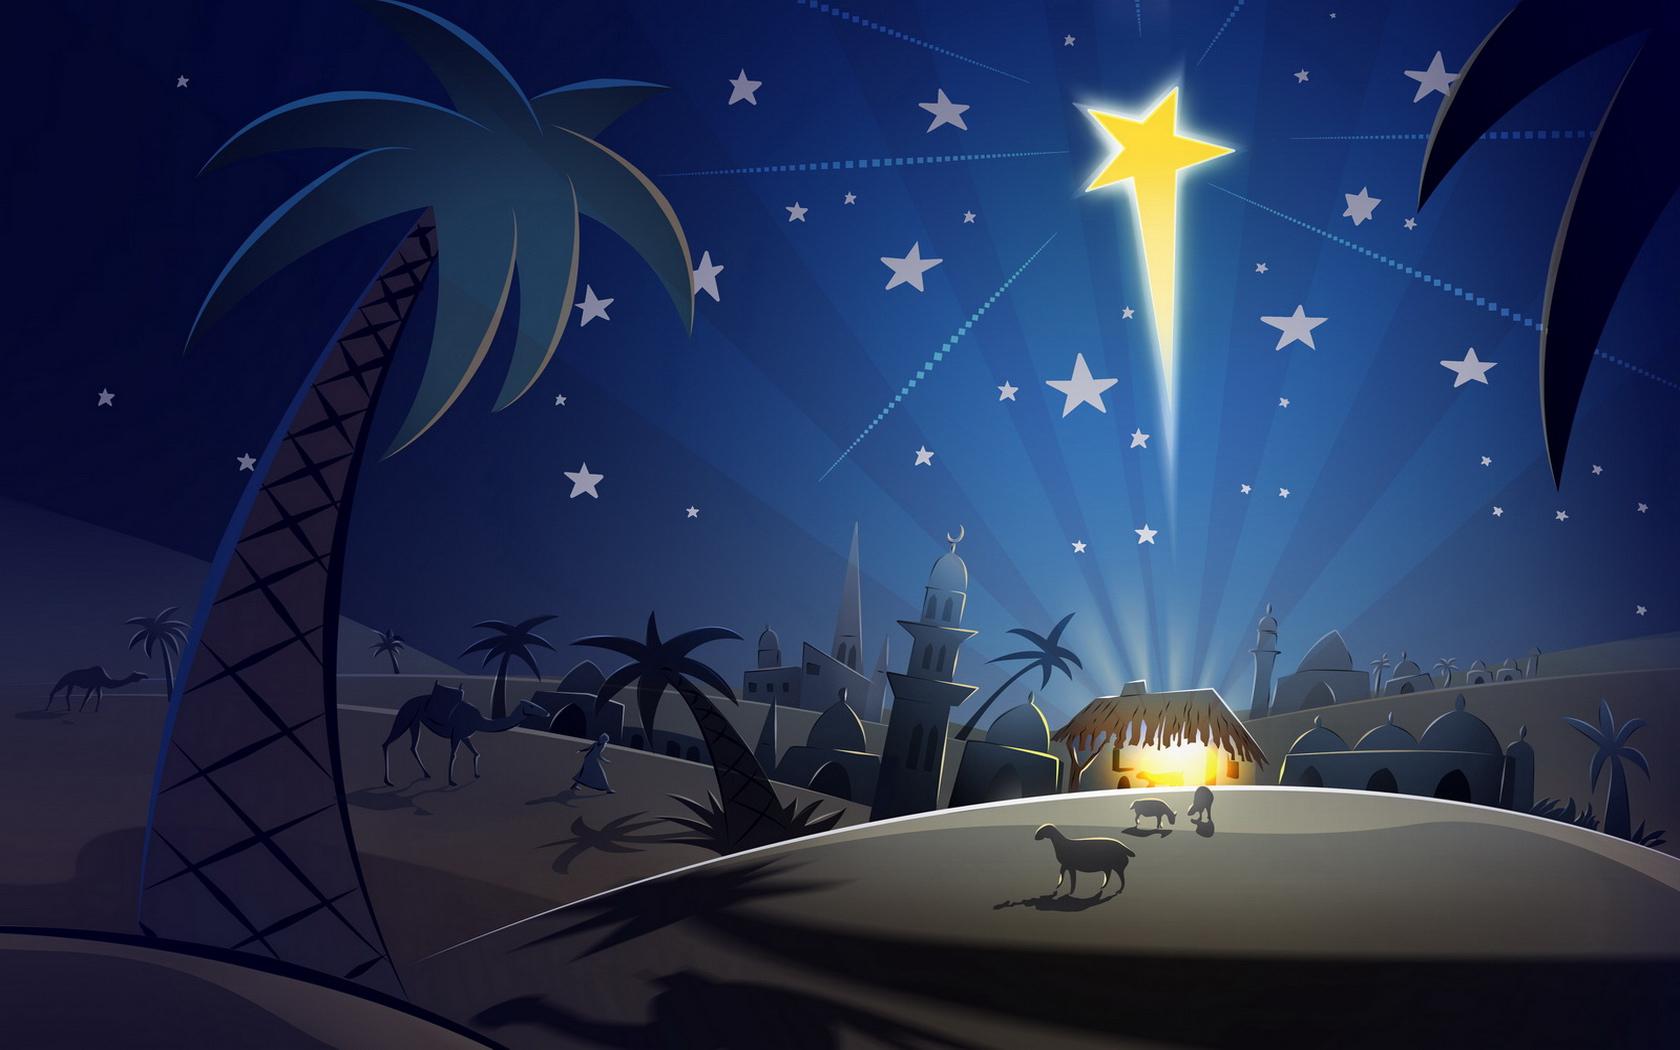 Christmas Nativity Wallpaper 2